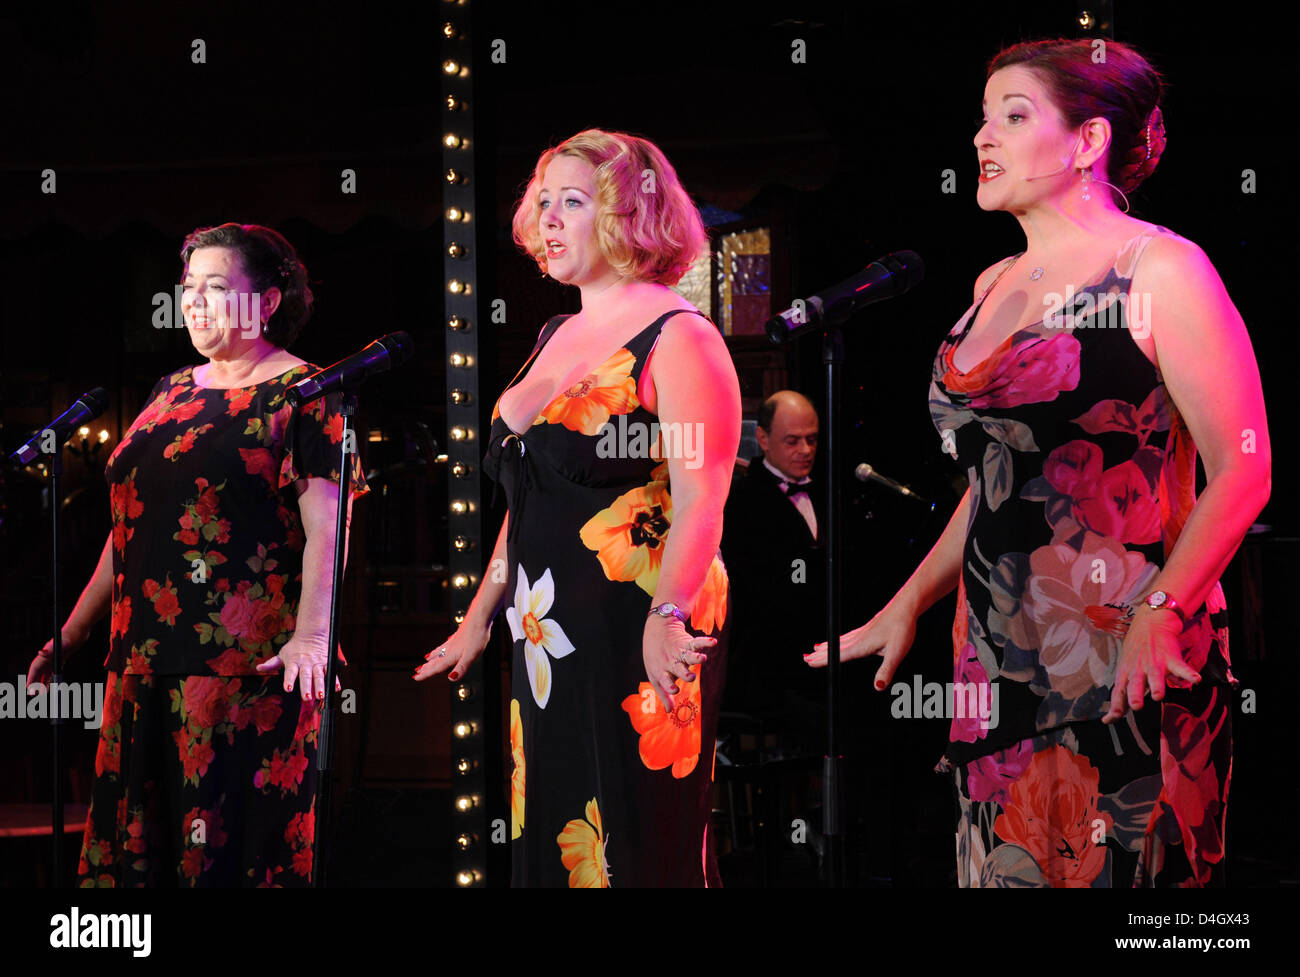 New Orleans based group 'The Pfister Sisters' (L-R) Holley Bendtsen, Debbie Davis and Yvette Voelker perform - Stock Image